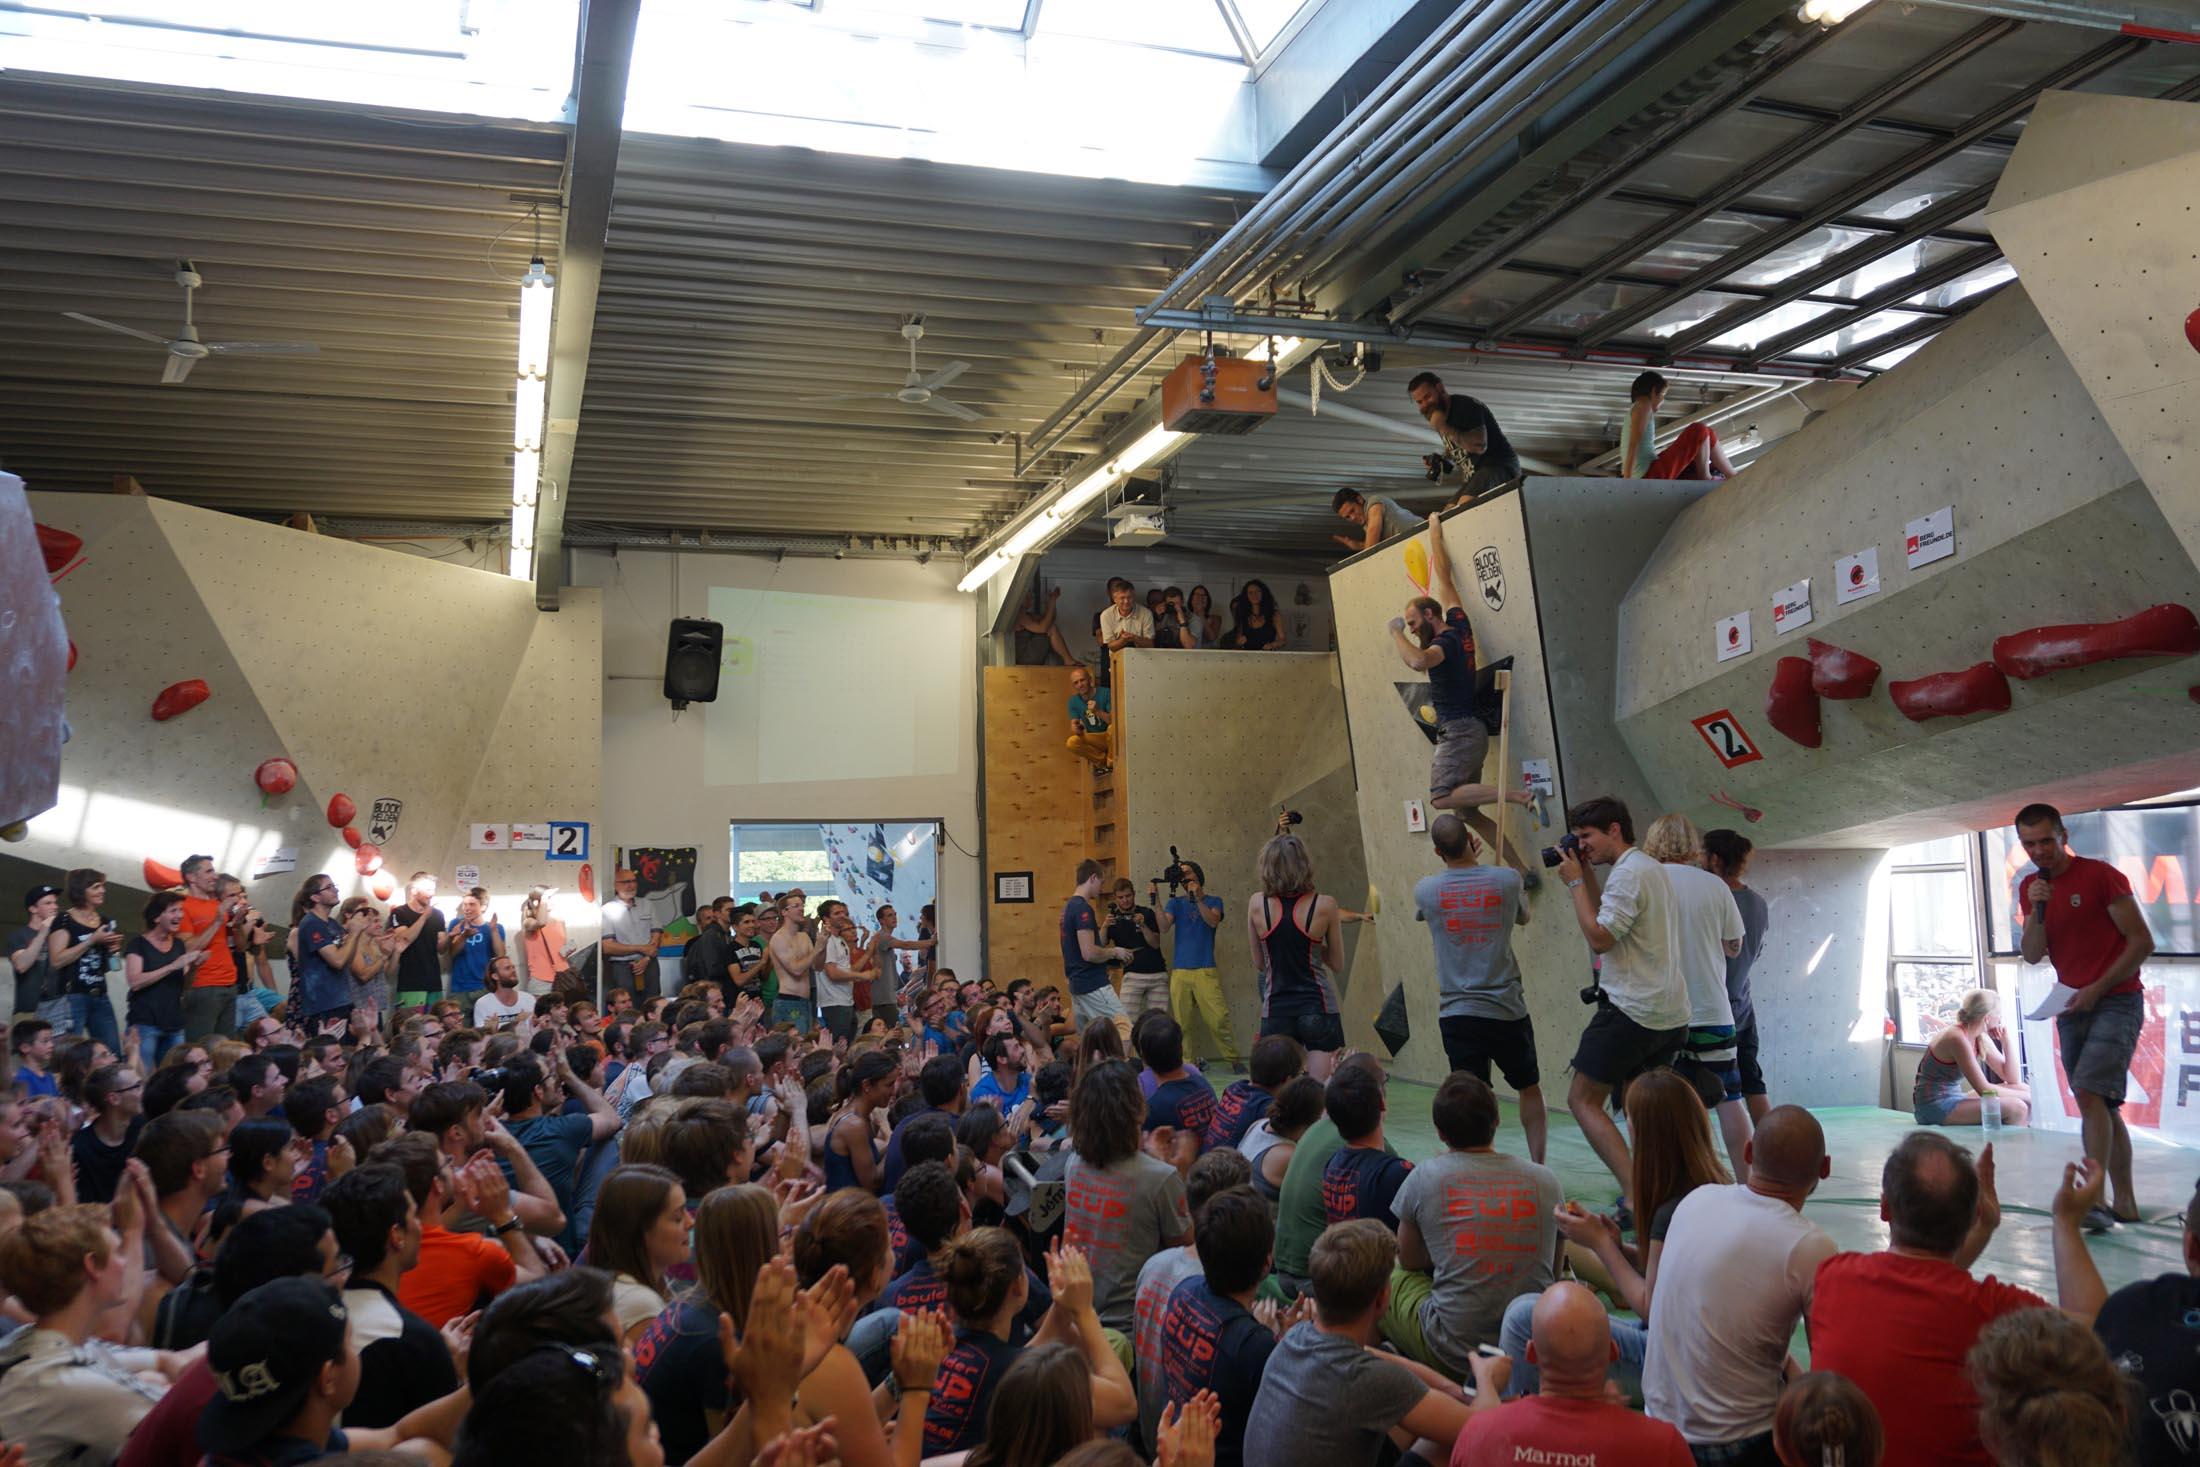 Finale, internationaler bouldercup Frankenjura 2016, BLOCKHELDEN Erlangen, Mammut, Bergfreunde.de, Boulderwettkampf07092016547